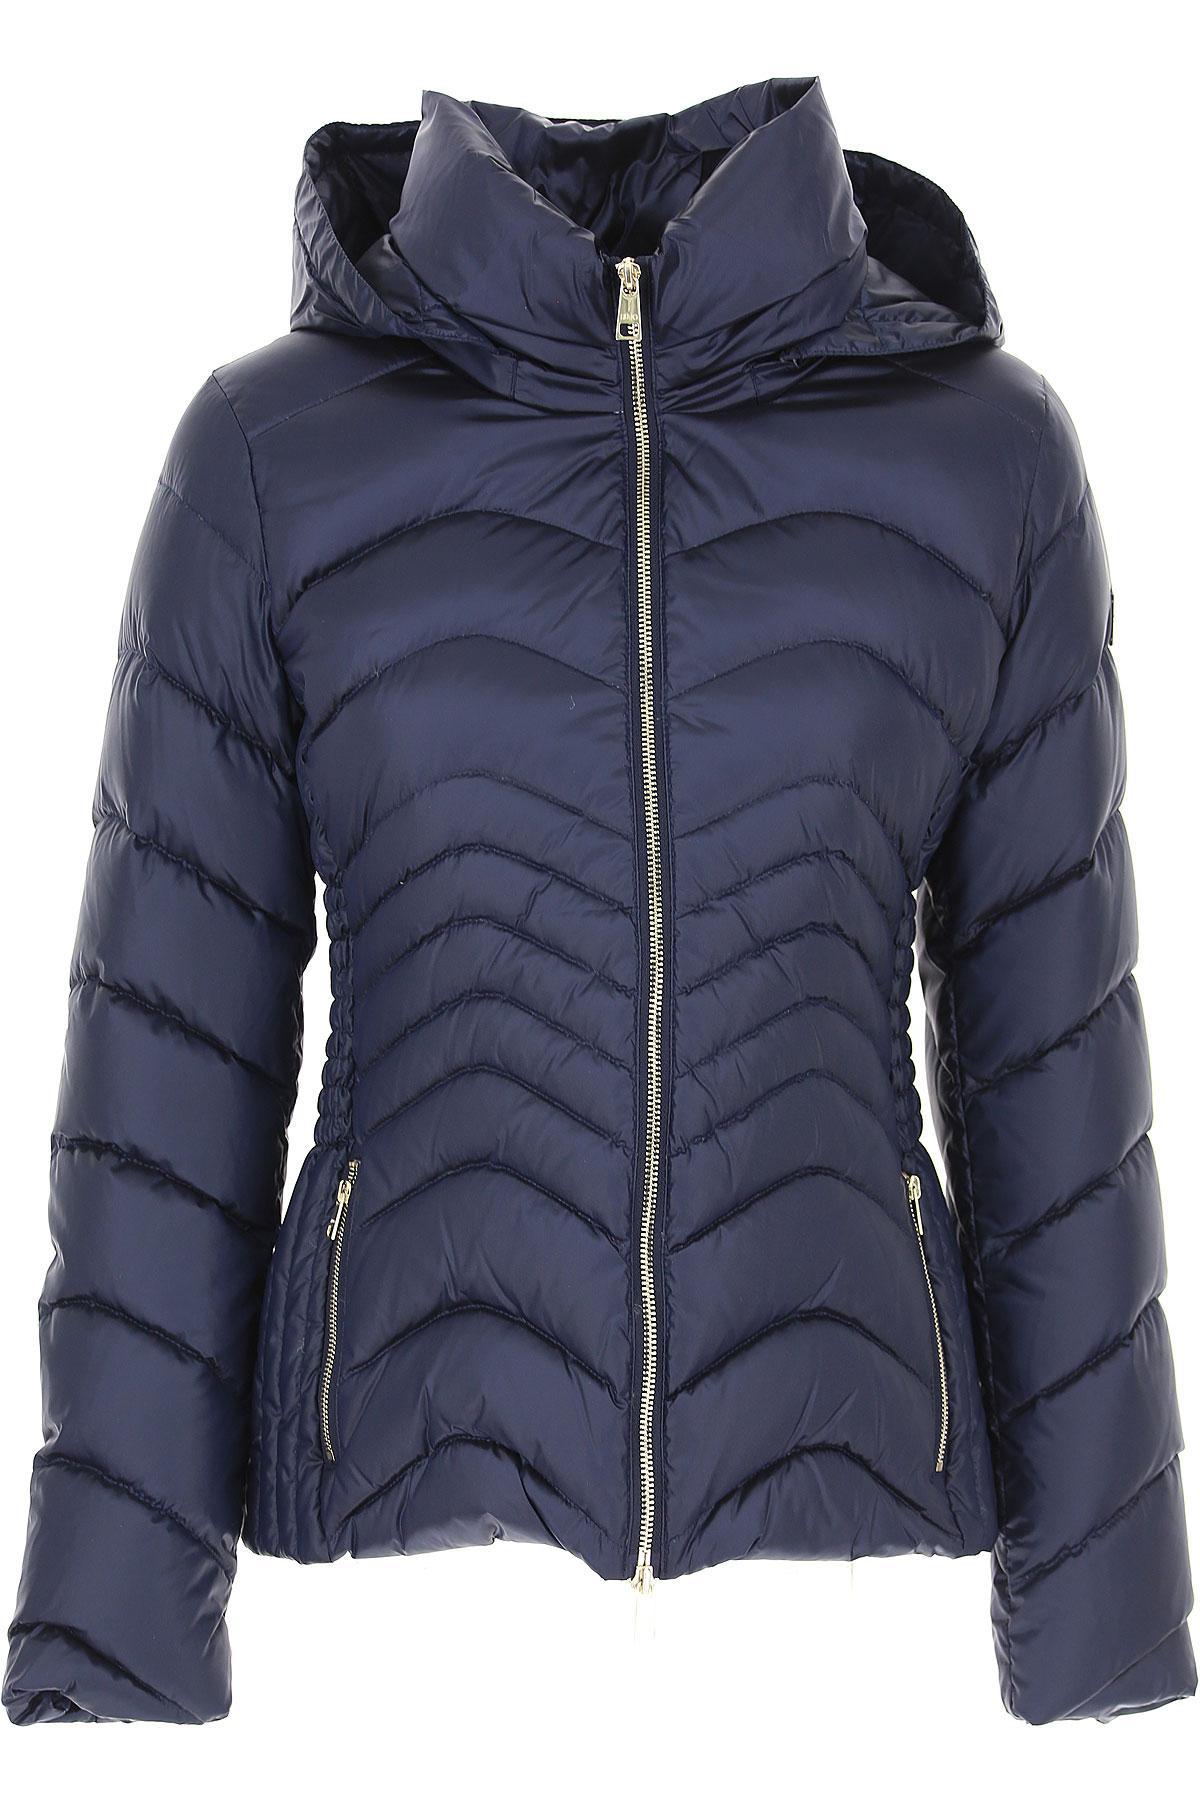 Image of Liu Jo Down Jacket for Women, Puffer Ski Jacket, Night Blue, polyester, 2017, 10 4 6